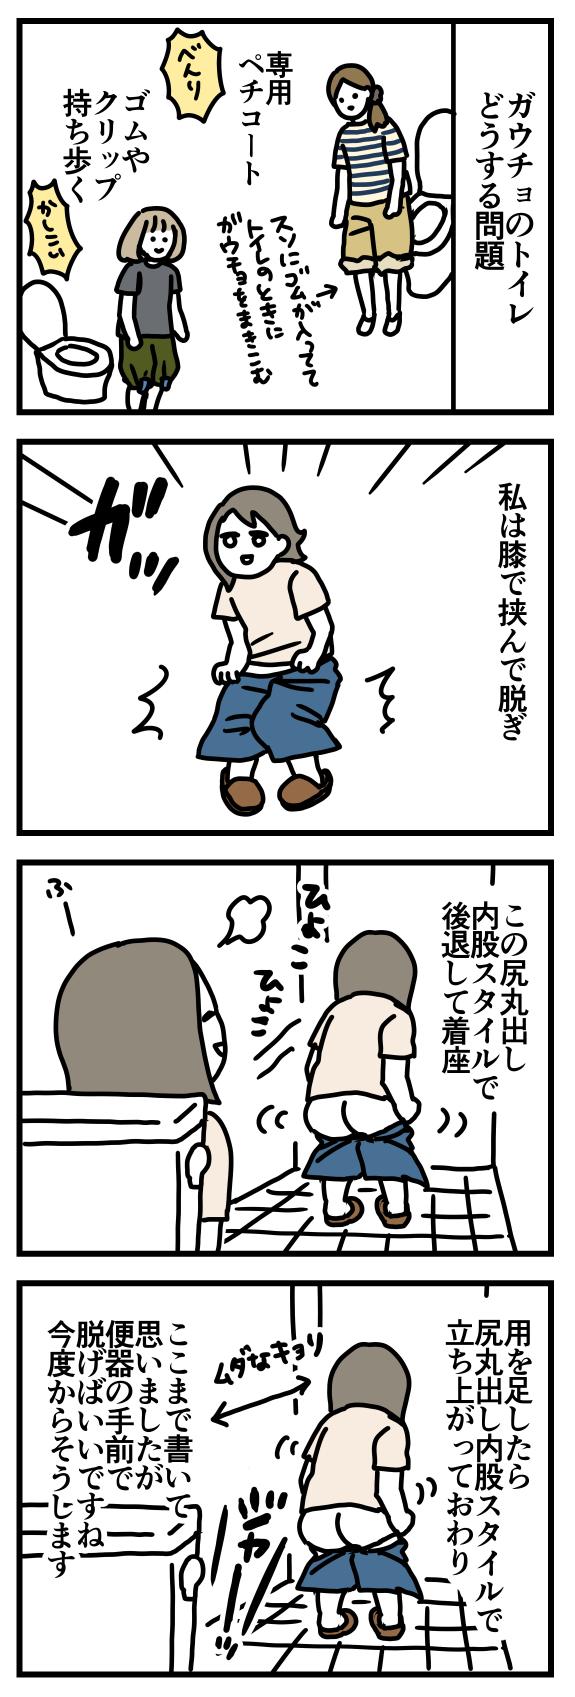 f:id:kanemotonomukuu:20171029195924j:plain